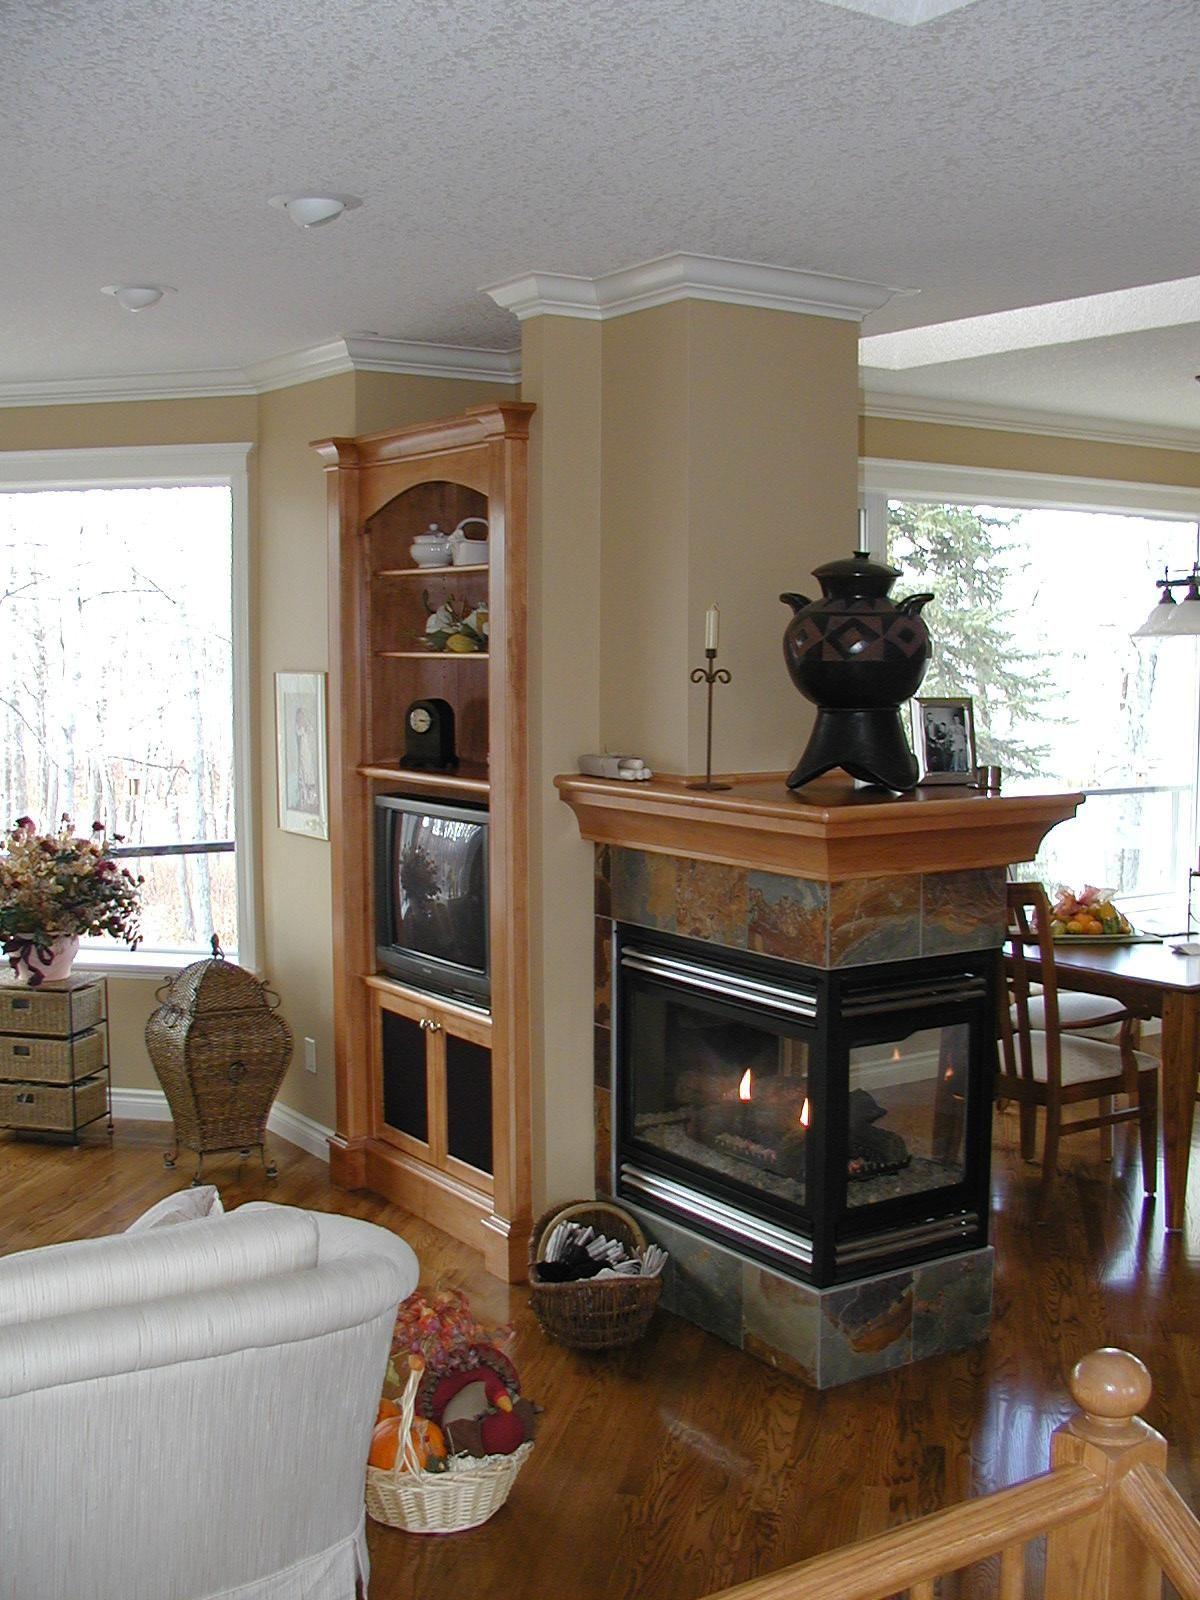 Large Decorative Pot Wall Shelf Decor Home Fireplace